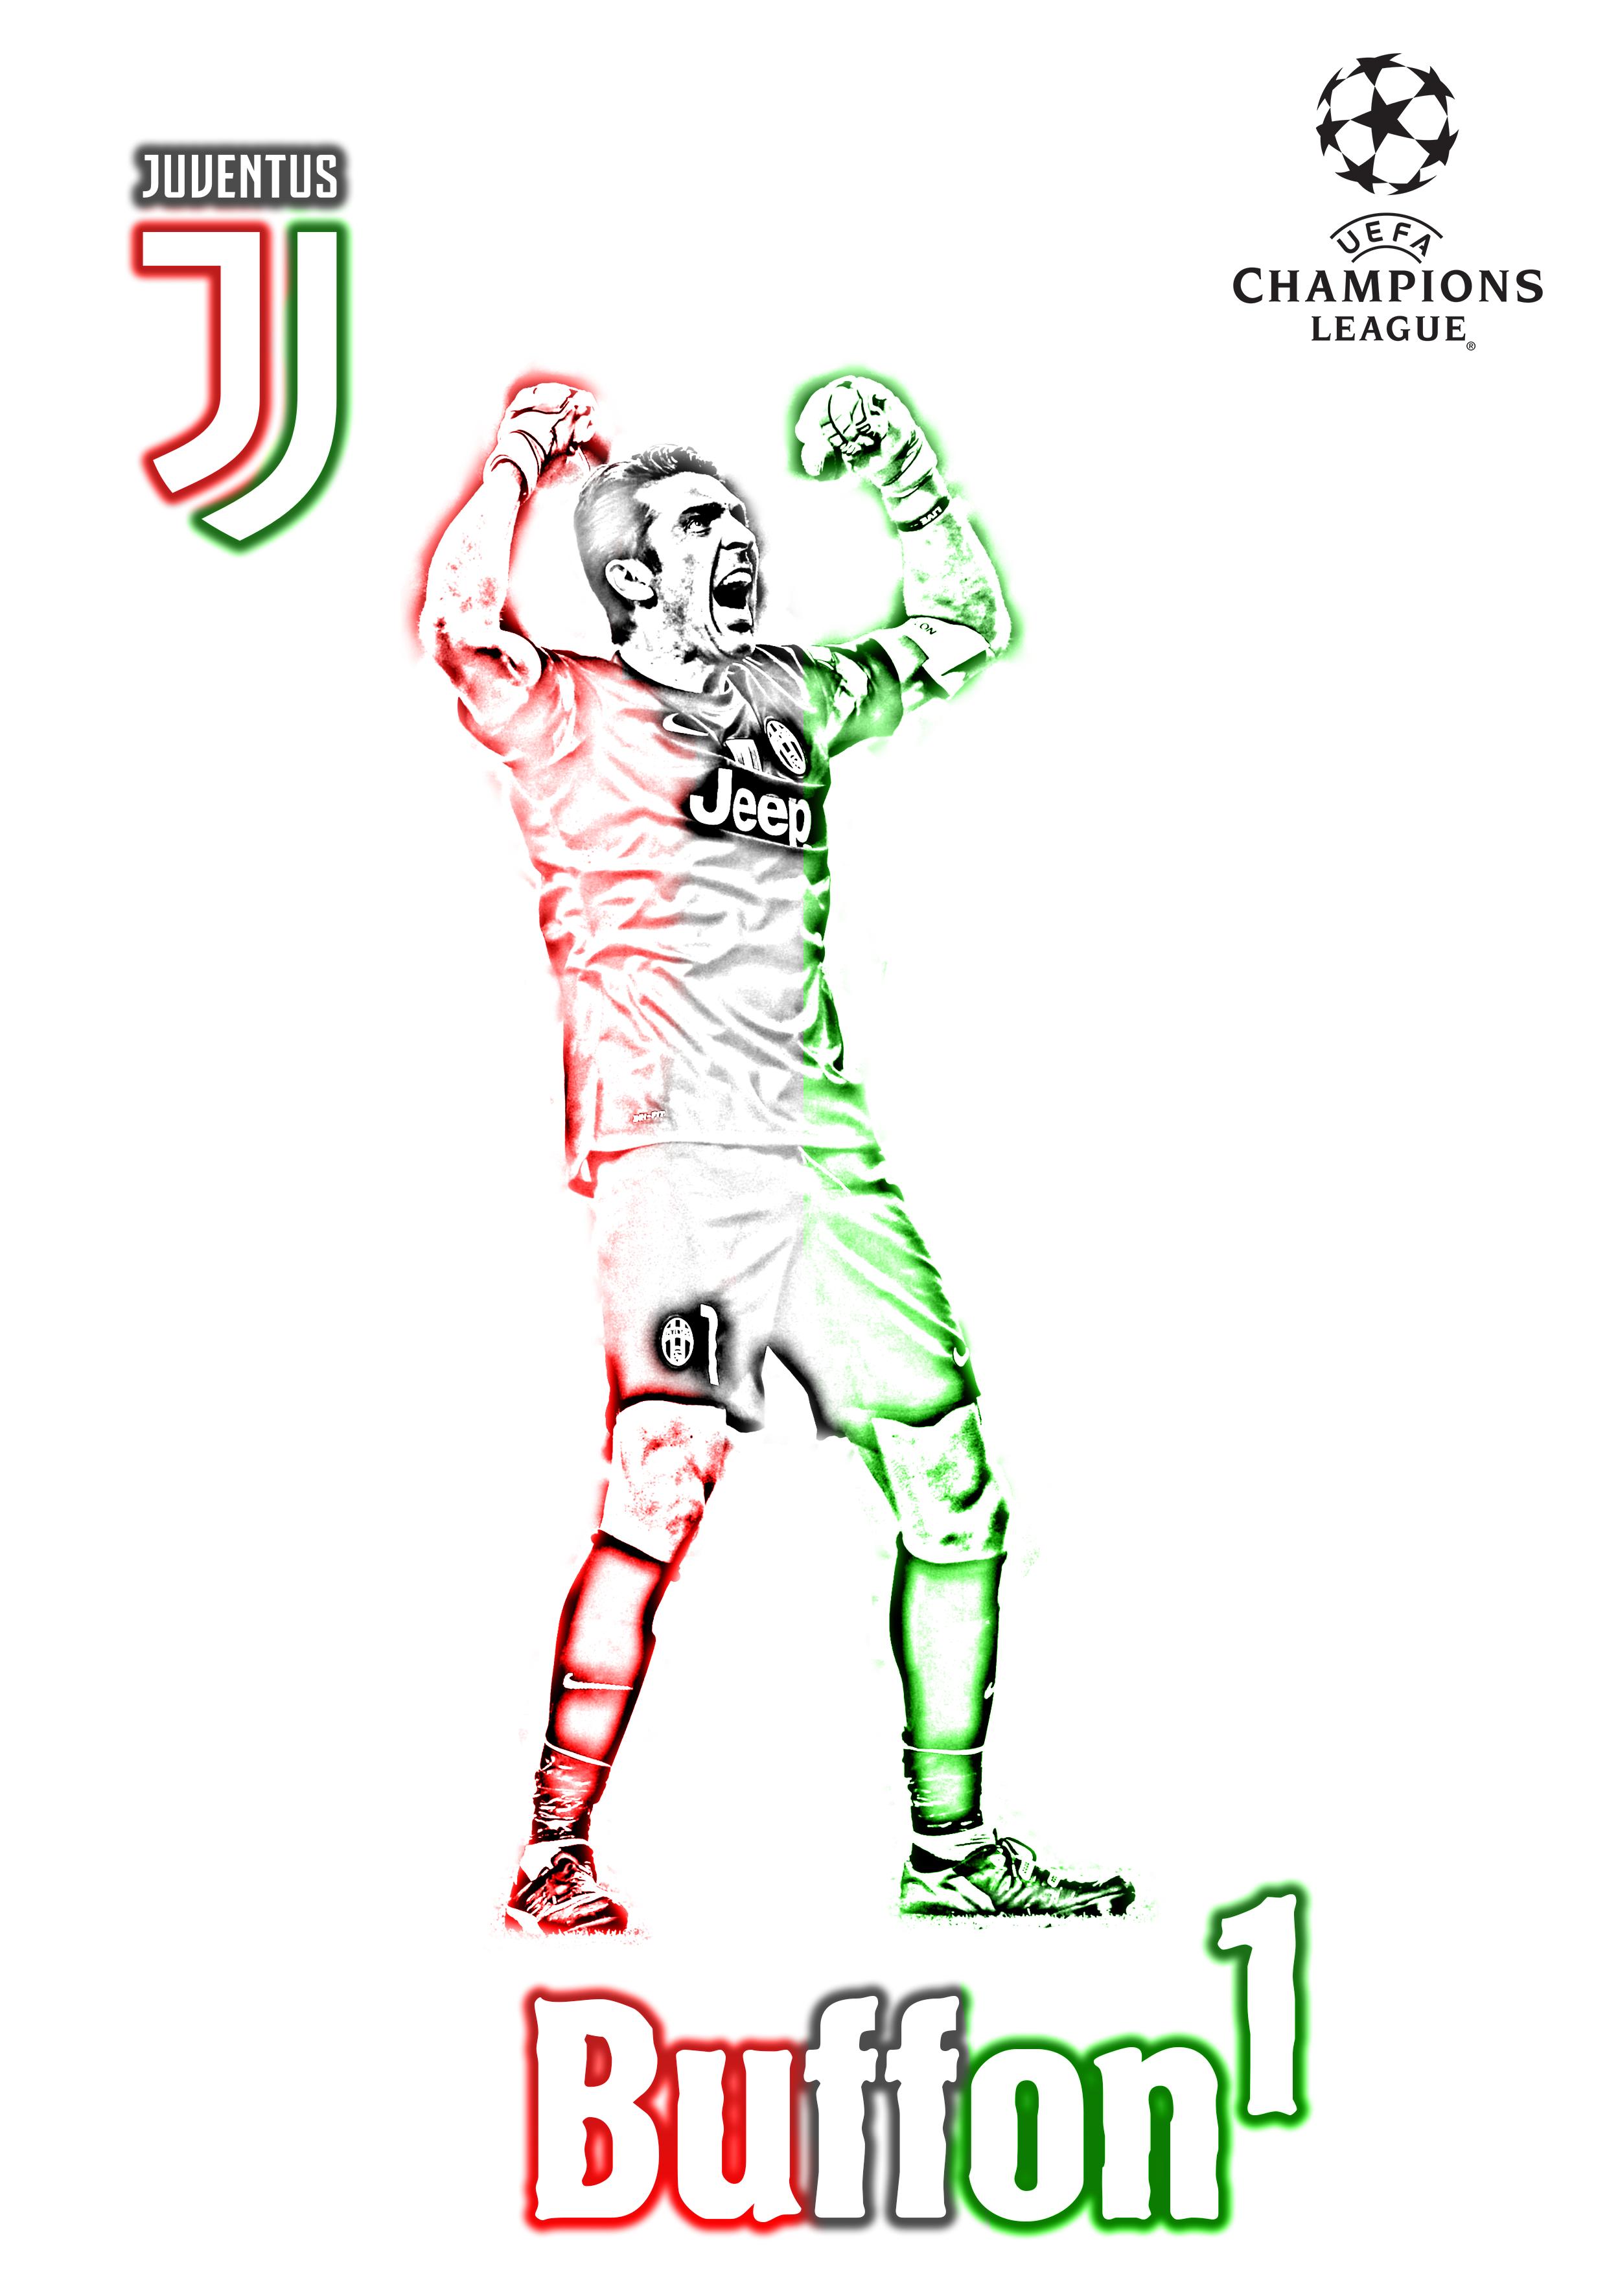 Buffon - Juventus - Champions League 2017 18 - BOB CALLIGARIS ... 4edaf5e7e2f